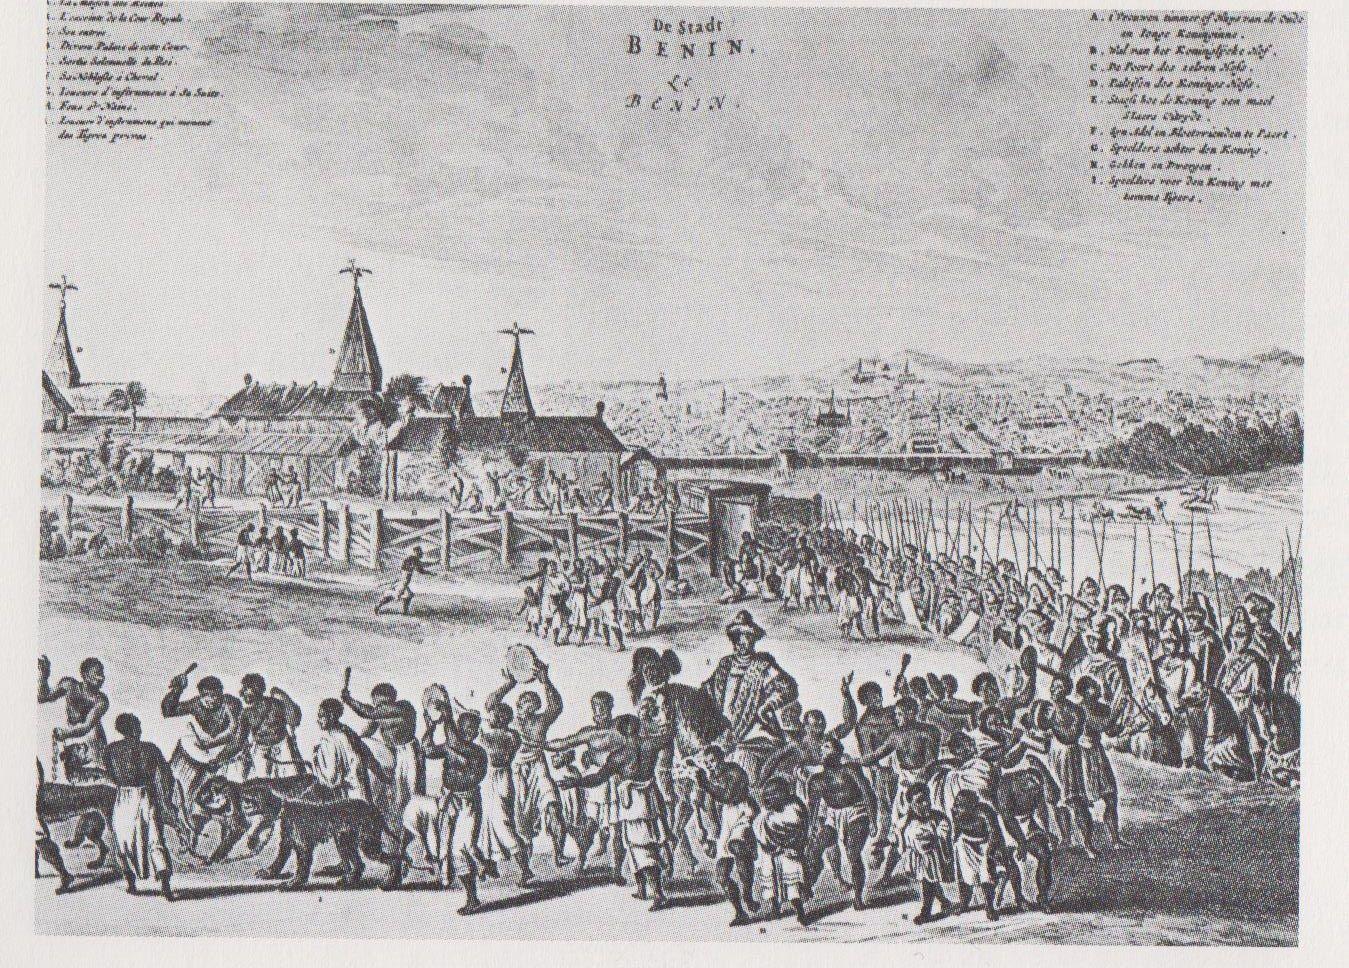 Suriname Slaves Origin Ghana Benin Loango Benin City West Africa African History